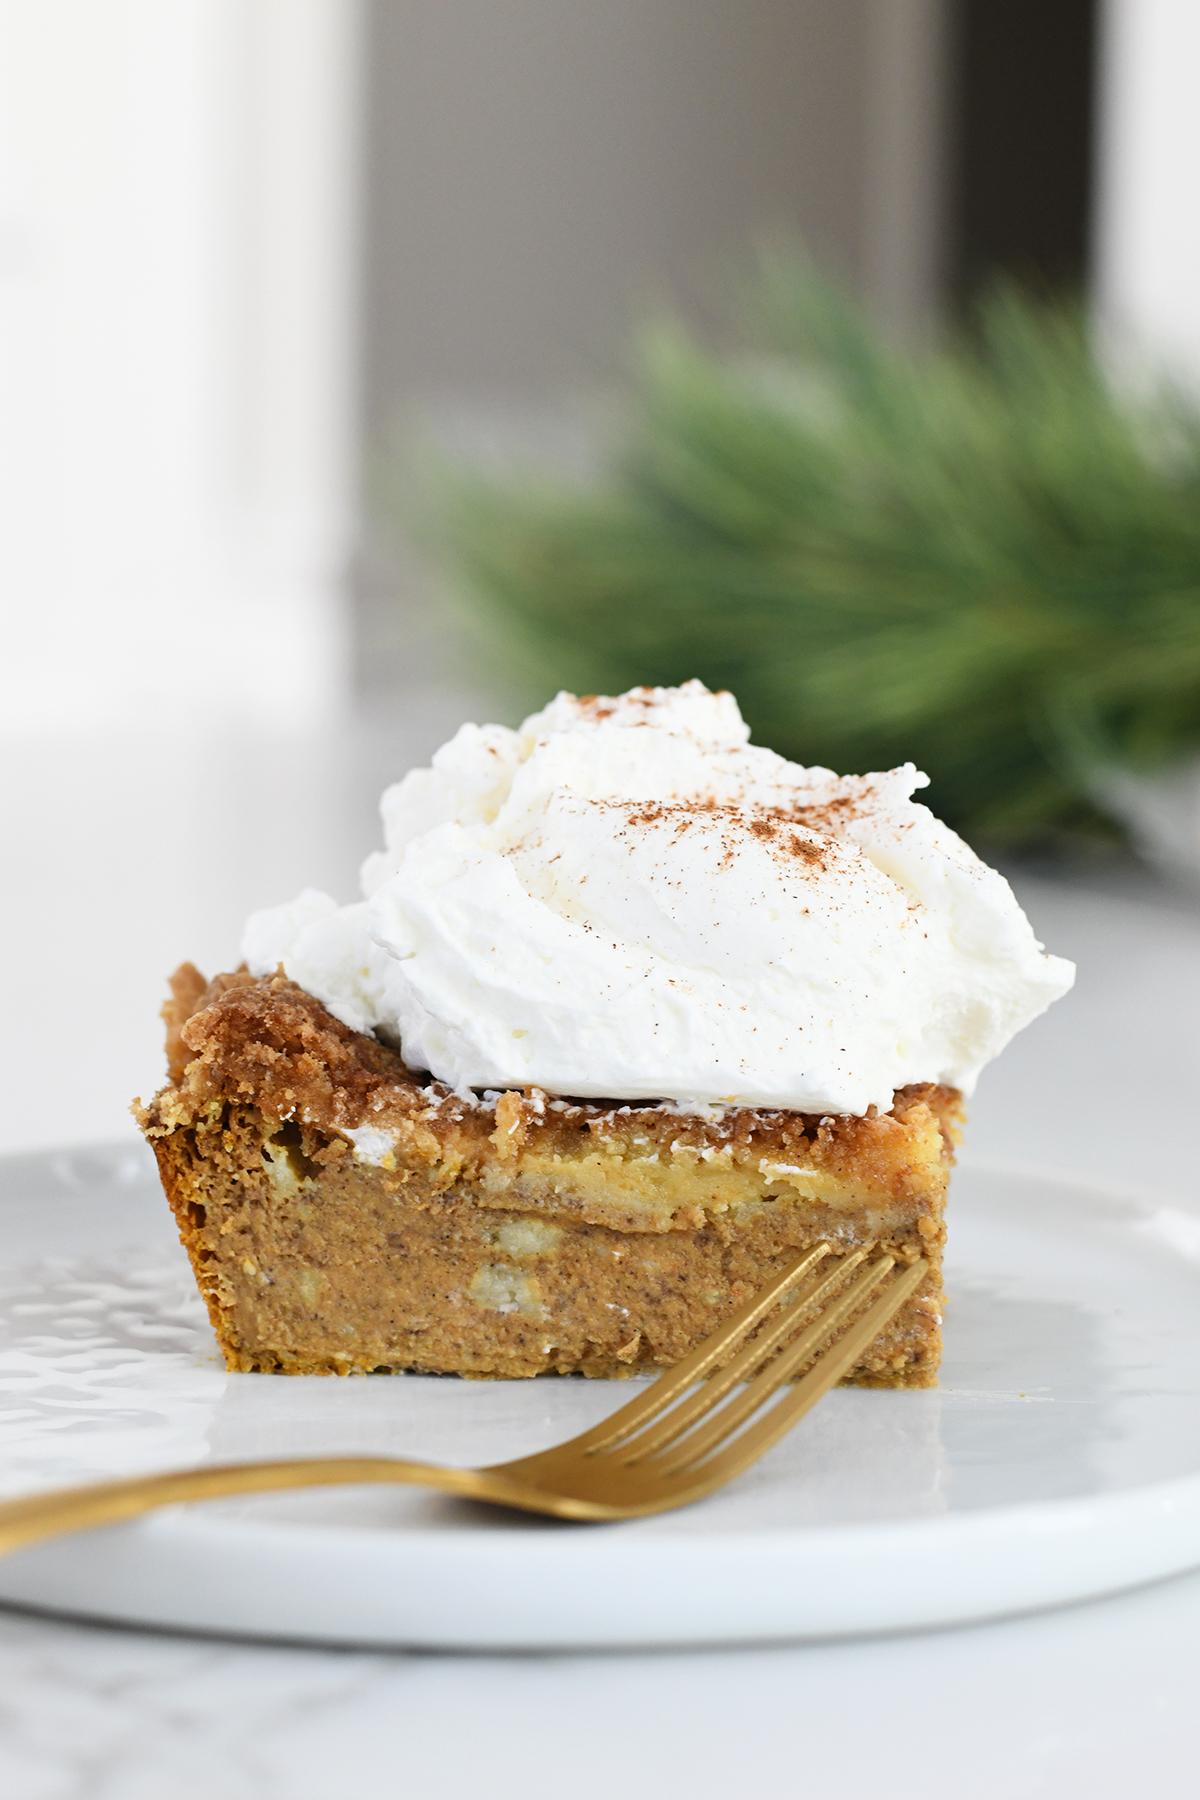 A delicious pumpkin dessert for Thanksgiving